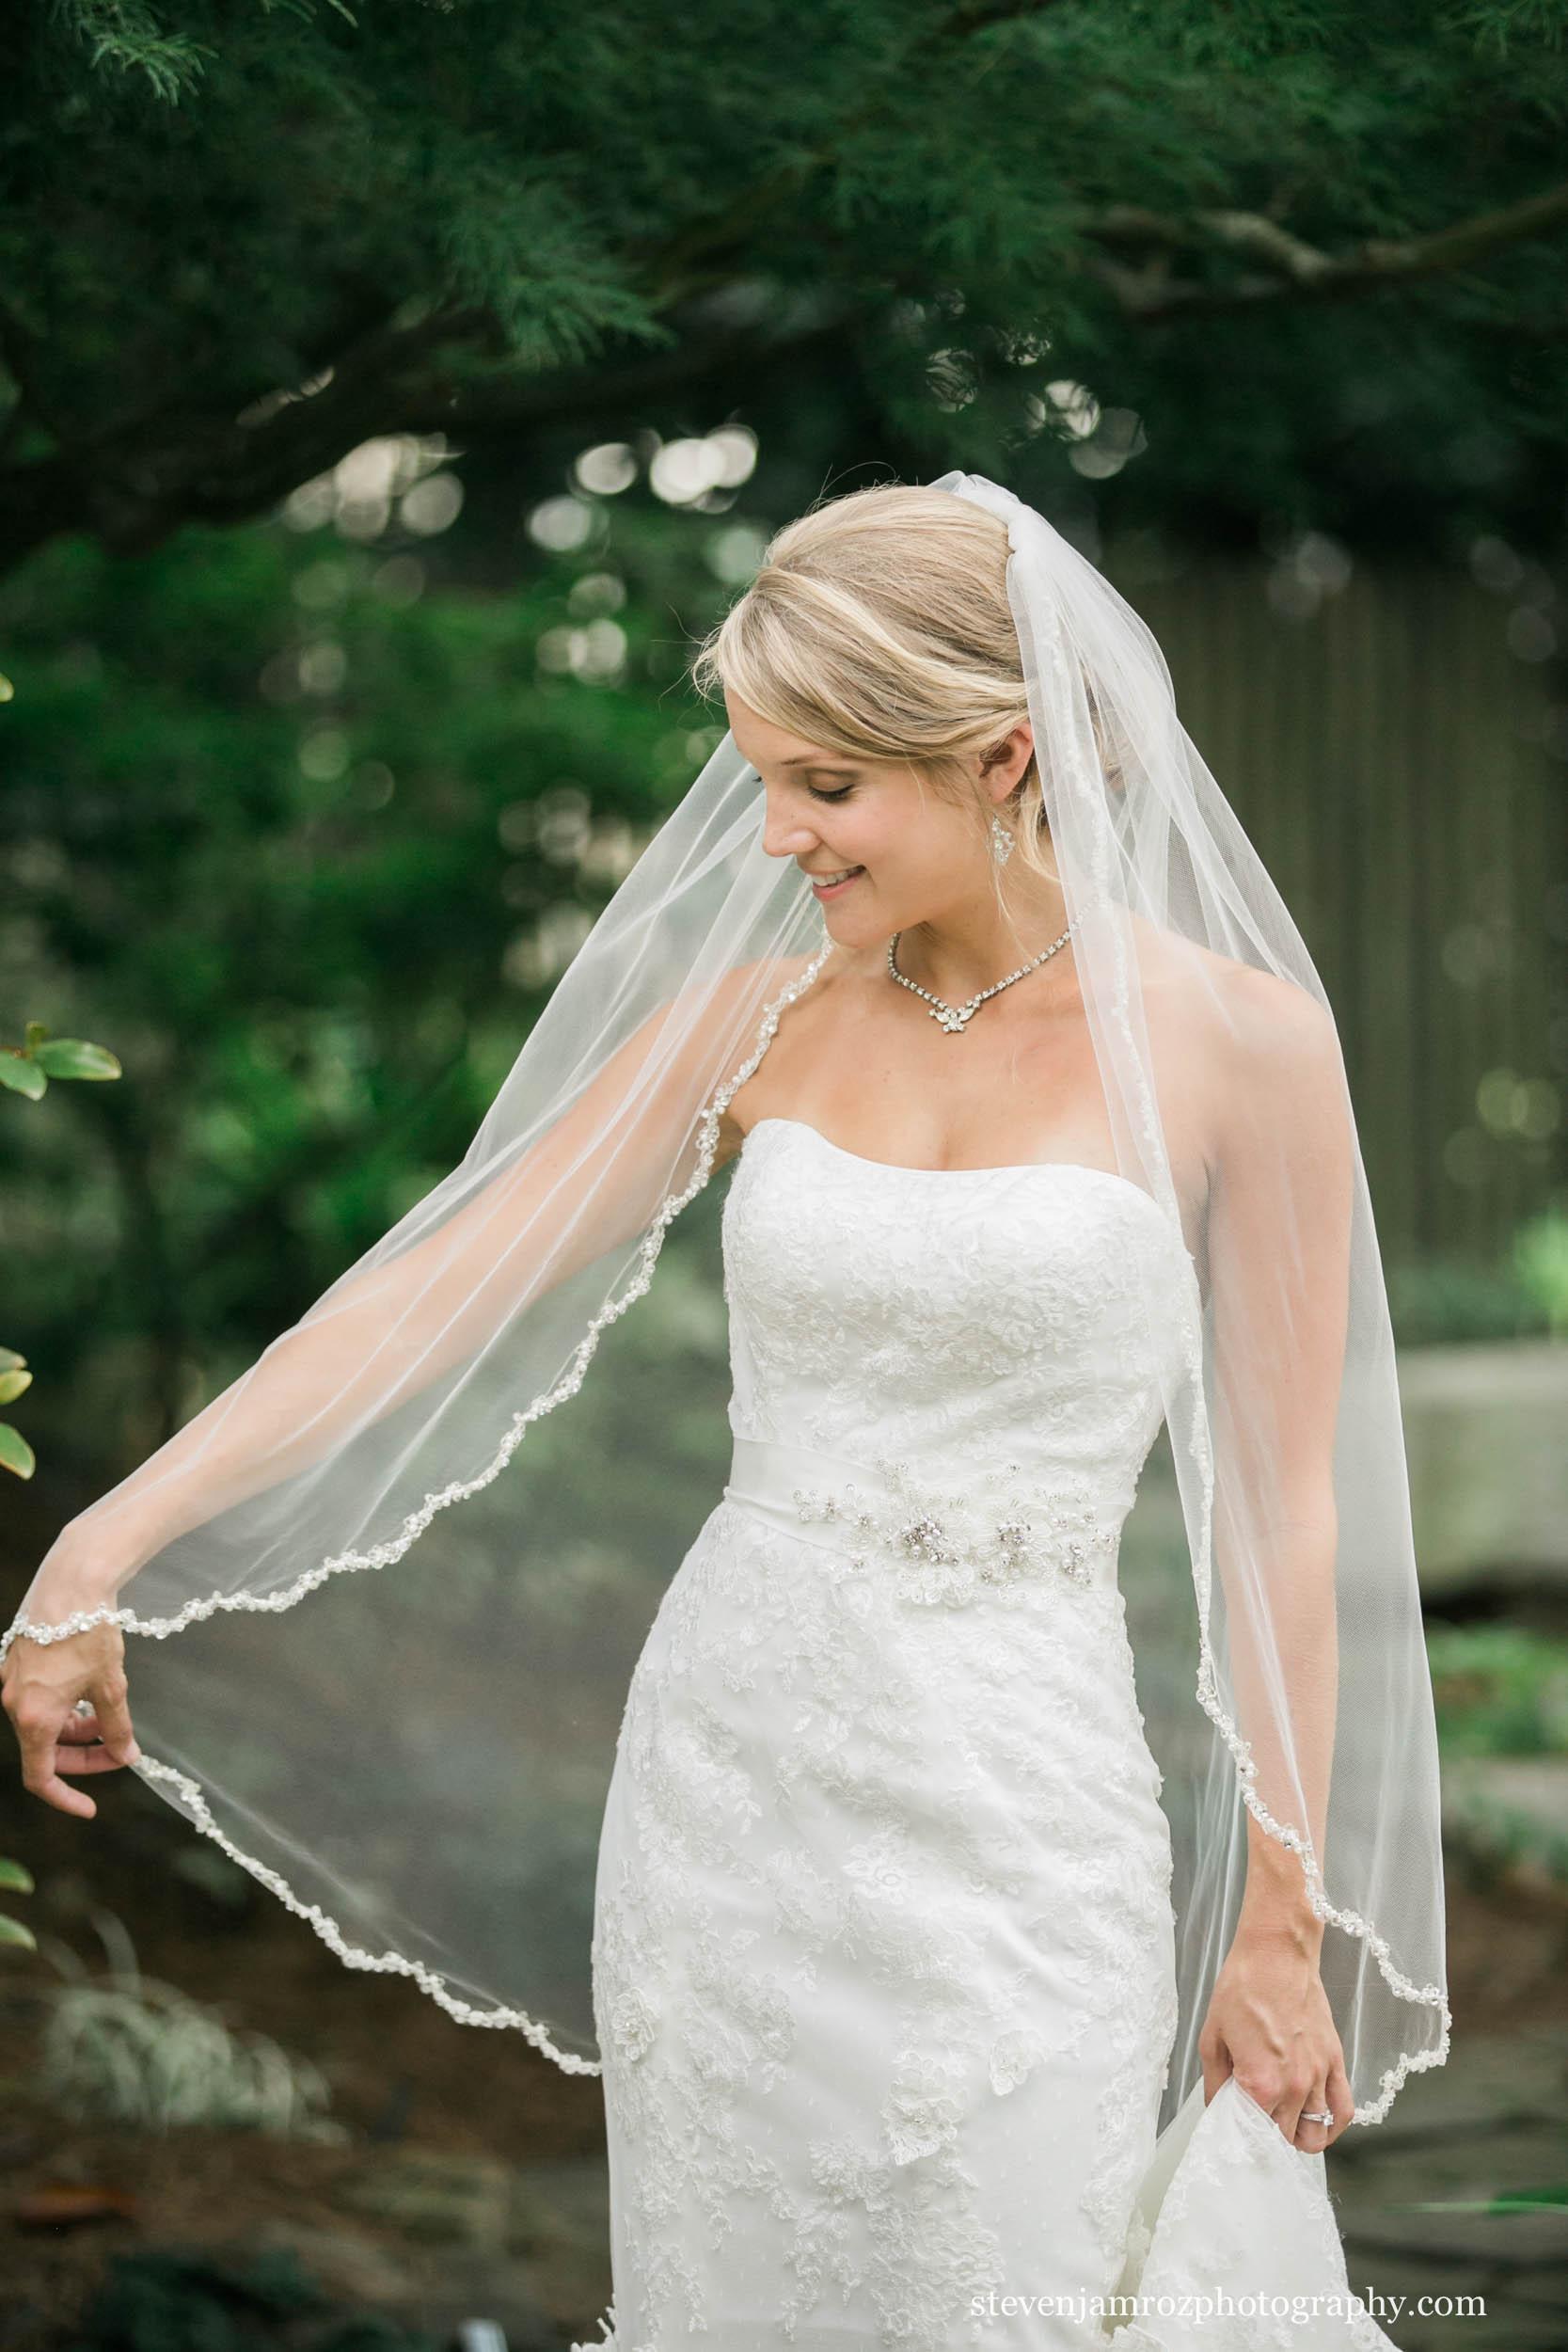 jc-raulston-bridal-portrait-wedding-steven-jamroz-photography-0622.jpg